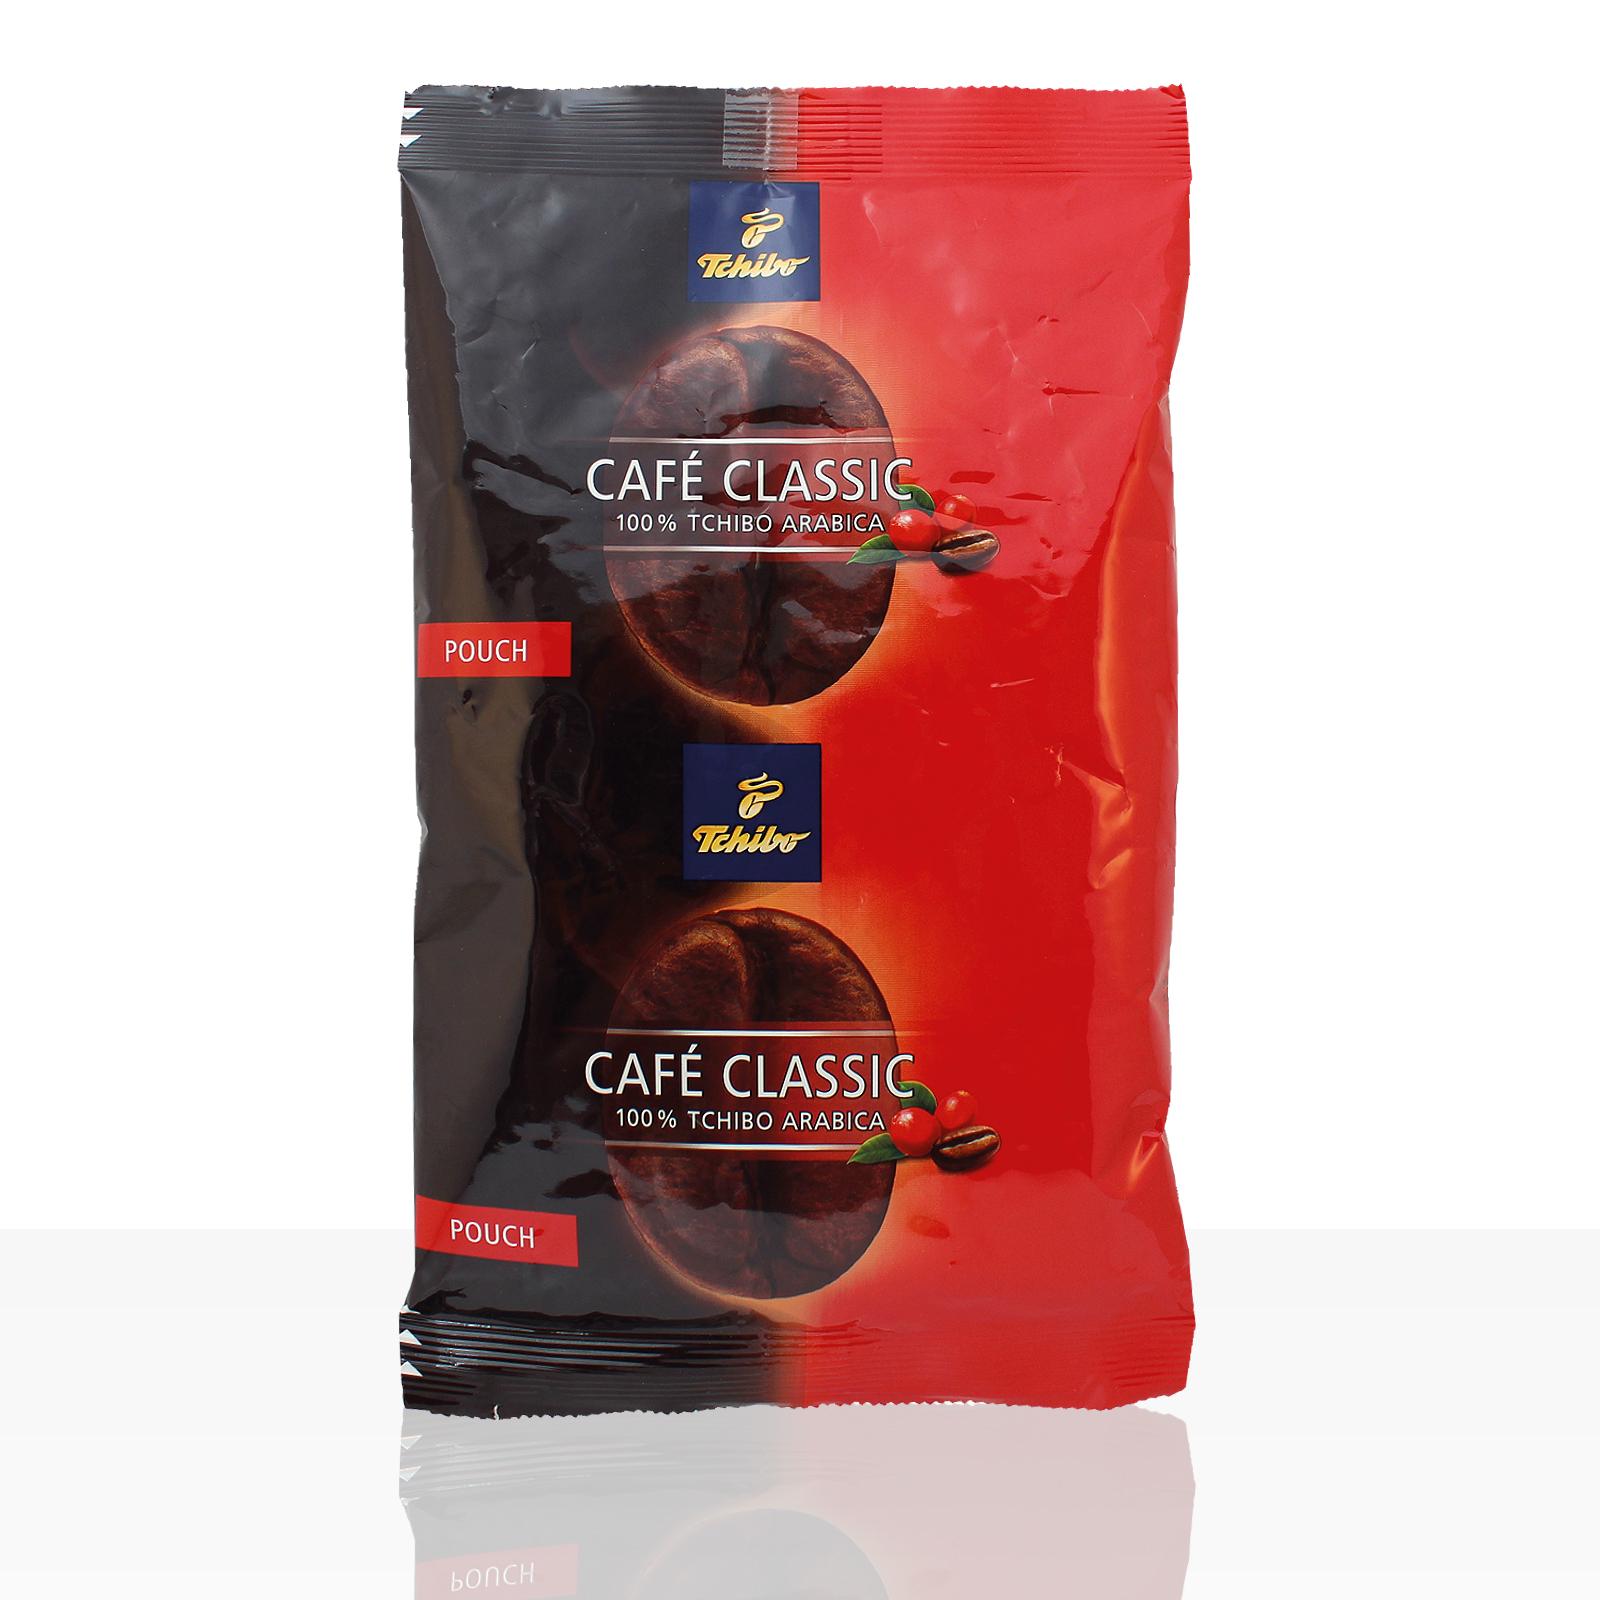 Sale - Tchibo Cafe Classic elegant Pouch - 36 x 65g Kaffee im Filterbeutel - kurzes MHD